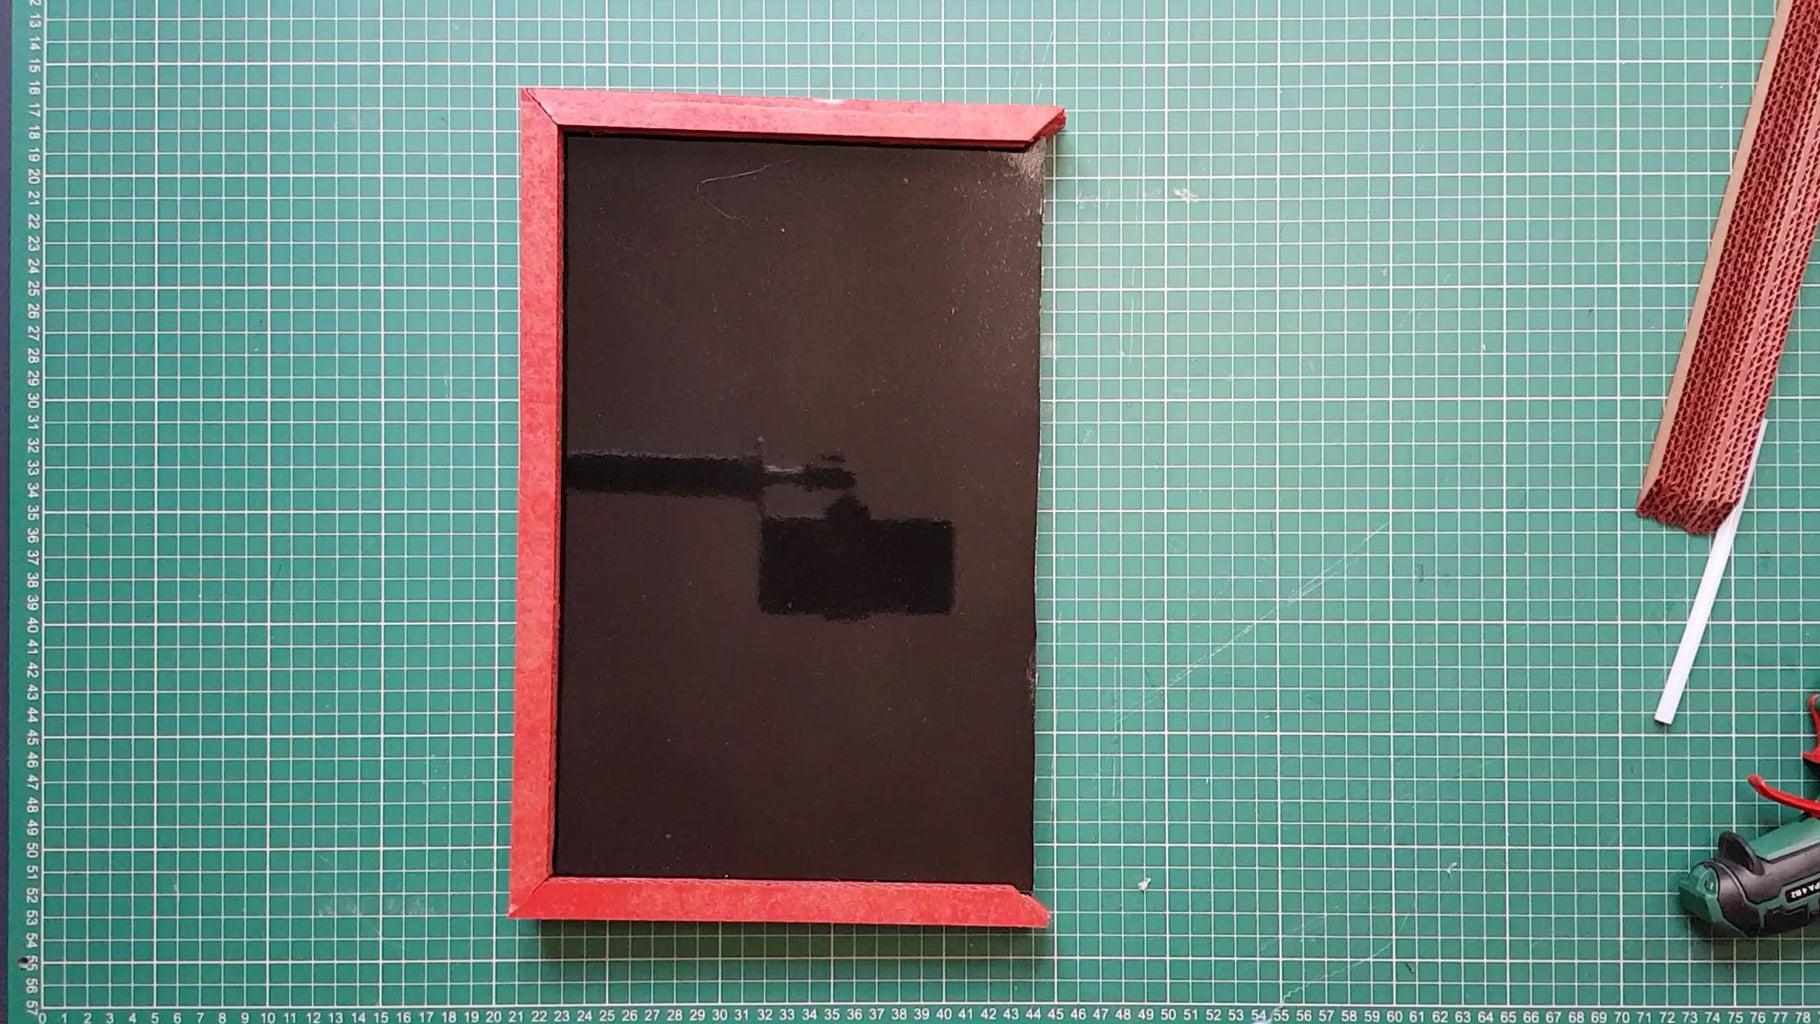 Glue the Frame Onto the Board